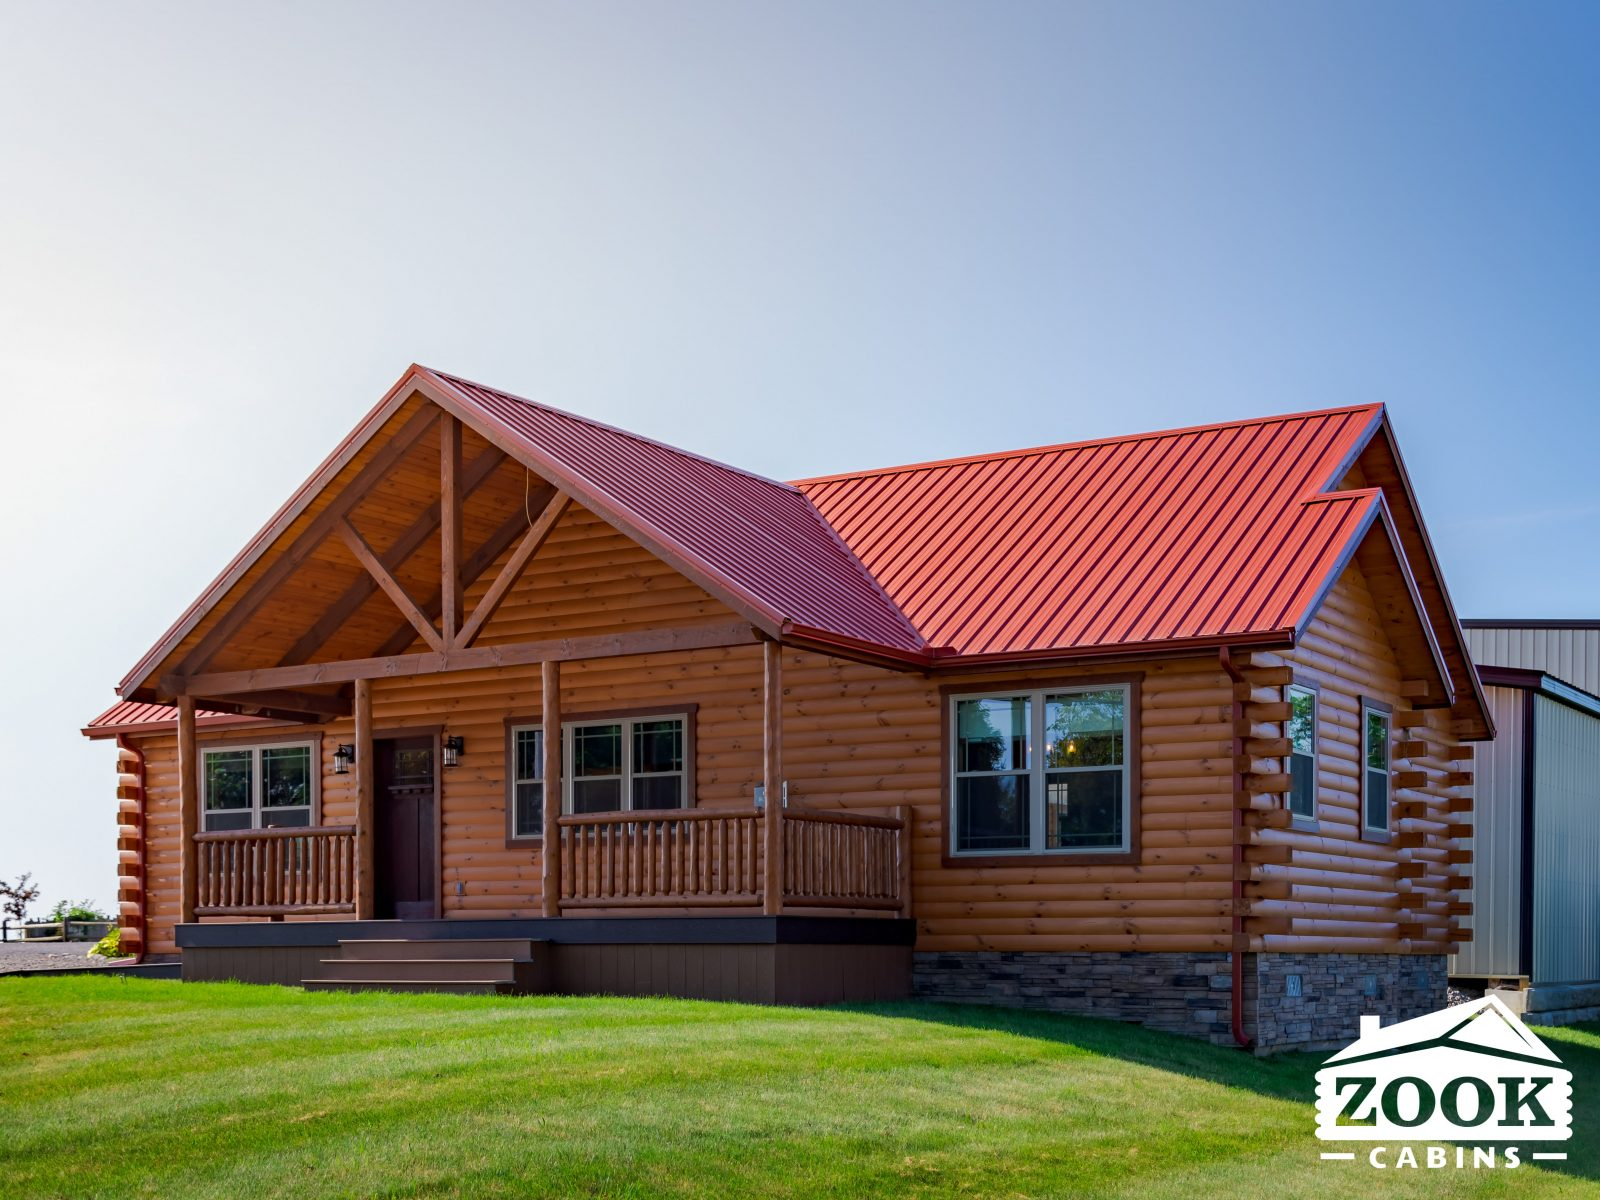 The Gable Porch ranch style cabin